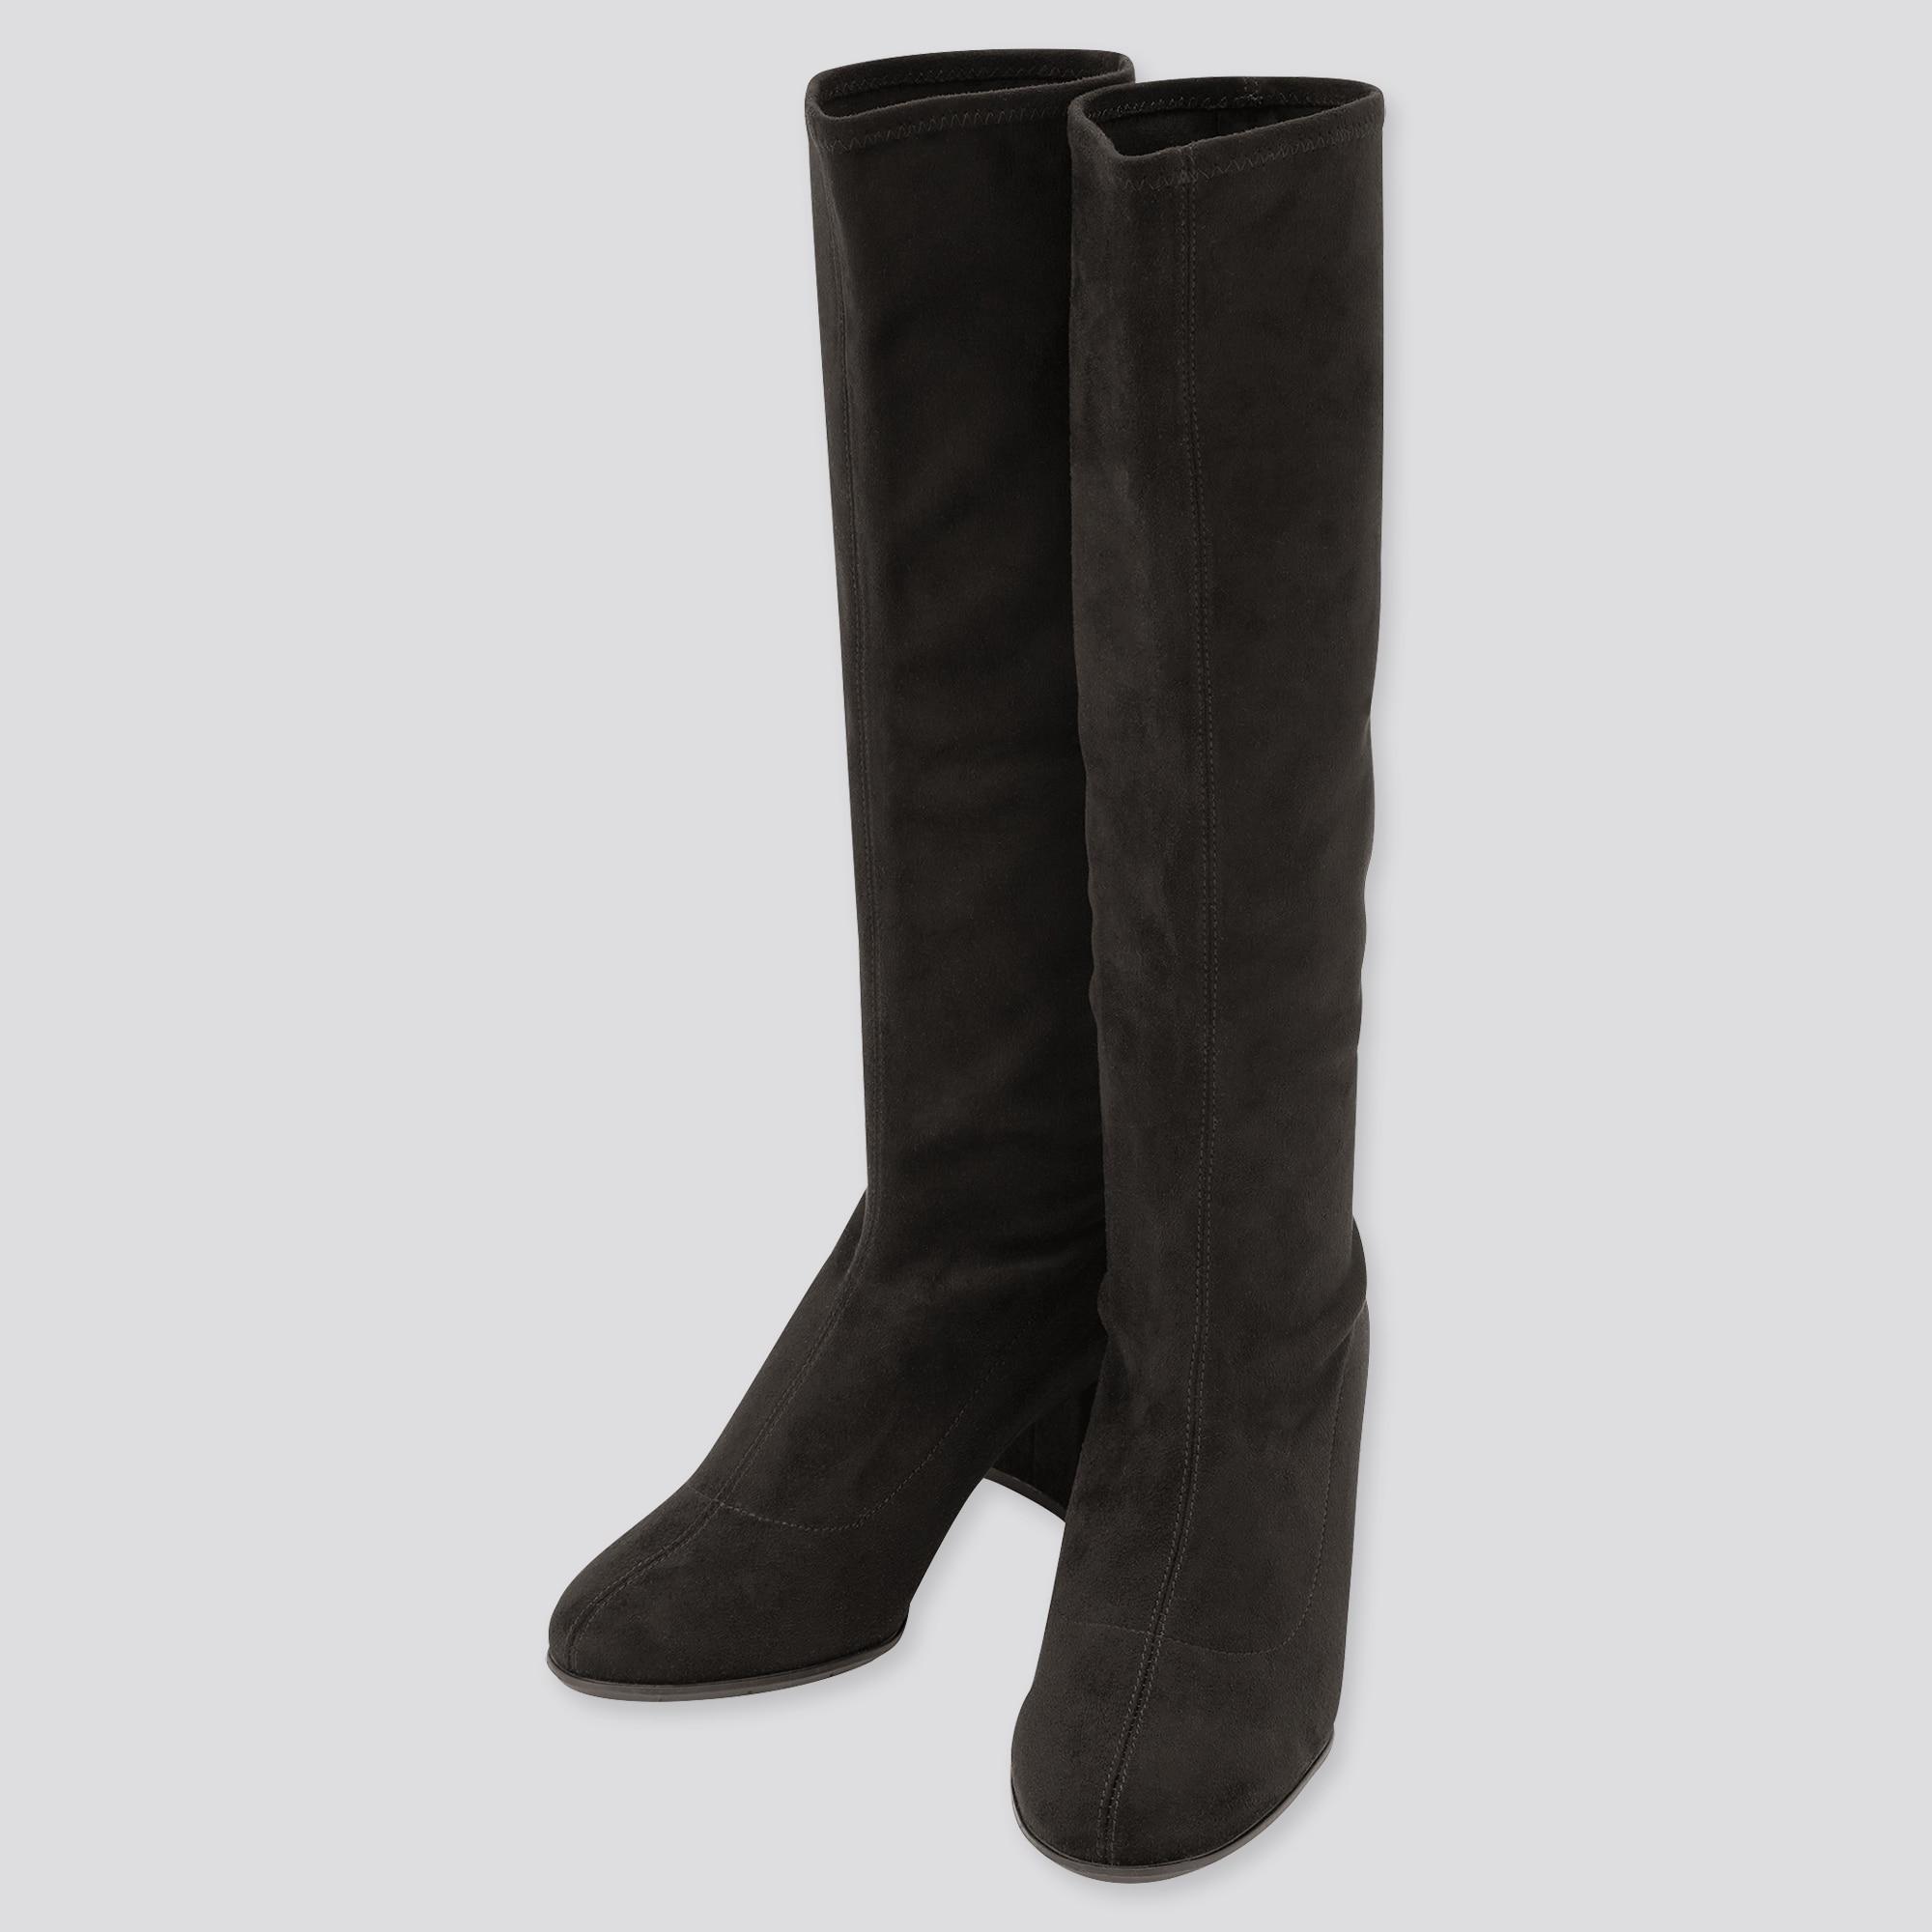 Women Stretch Short Boots | UNIQLO